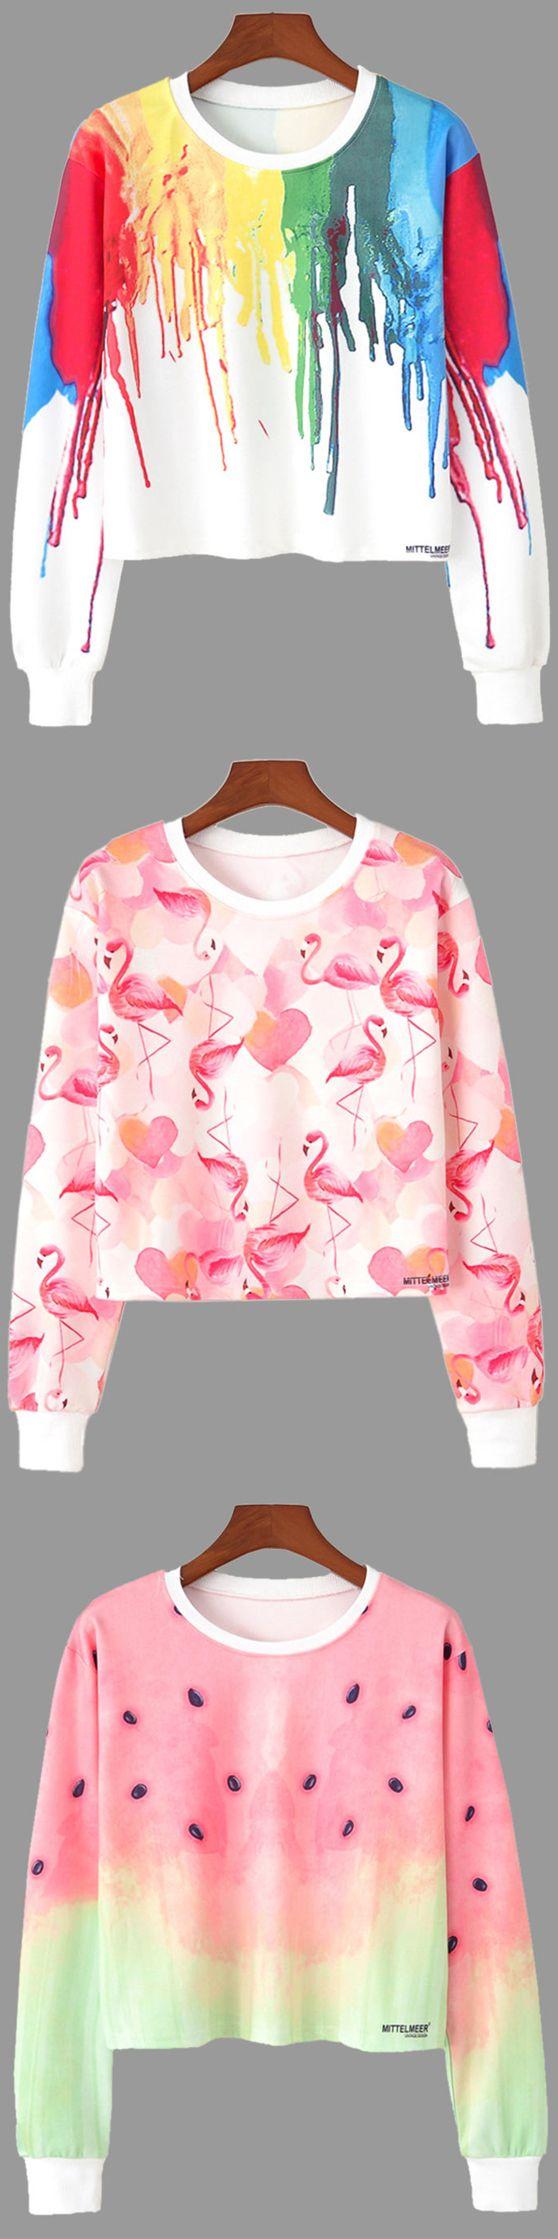 Up to 68% OFF! Crew Neck Splatter Print Sweatshirt. Zaful,zaful.com,zaful fashion,tops,womens tops,outerwear,sweatshirts,hoodies,hoodies outfit,hoodies for teens,sweatshirts outfit,long sleeve tops,sweatshirts for teens,winter outfits,fall outfits,tops,sweatshirts for women,women's hoodies,womens sweatshirts,cute sweatshirts,floral hoodie,crop hoodies,oversized sweatshirt, halloween costumes,halloween,halloween outfits,halloween tops,halloween costume ideas. @zaful Extra 10% OFF Code:ZF2017